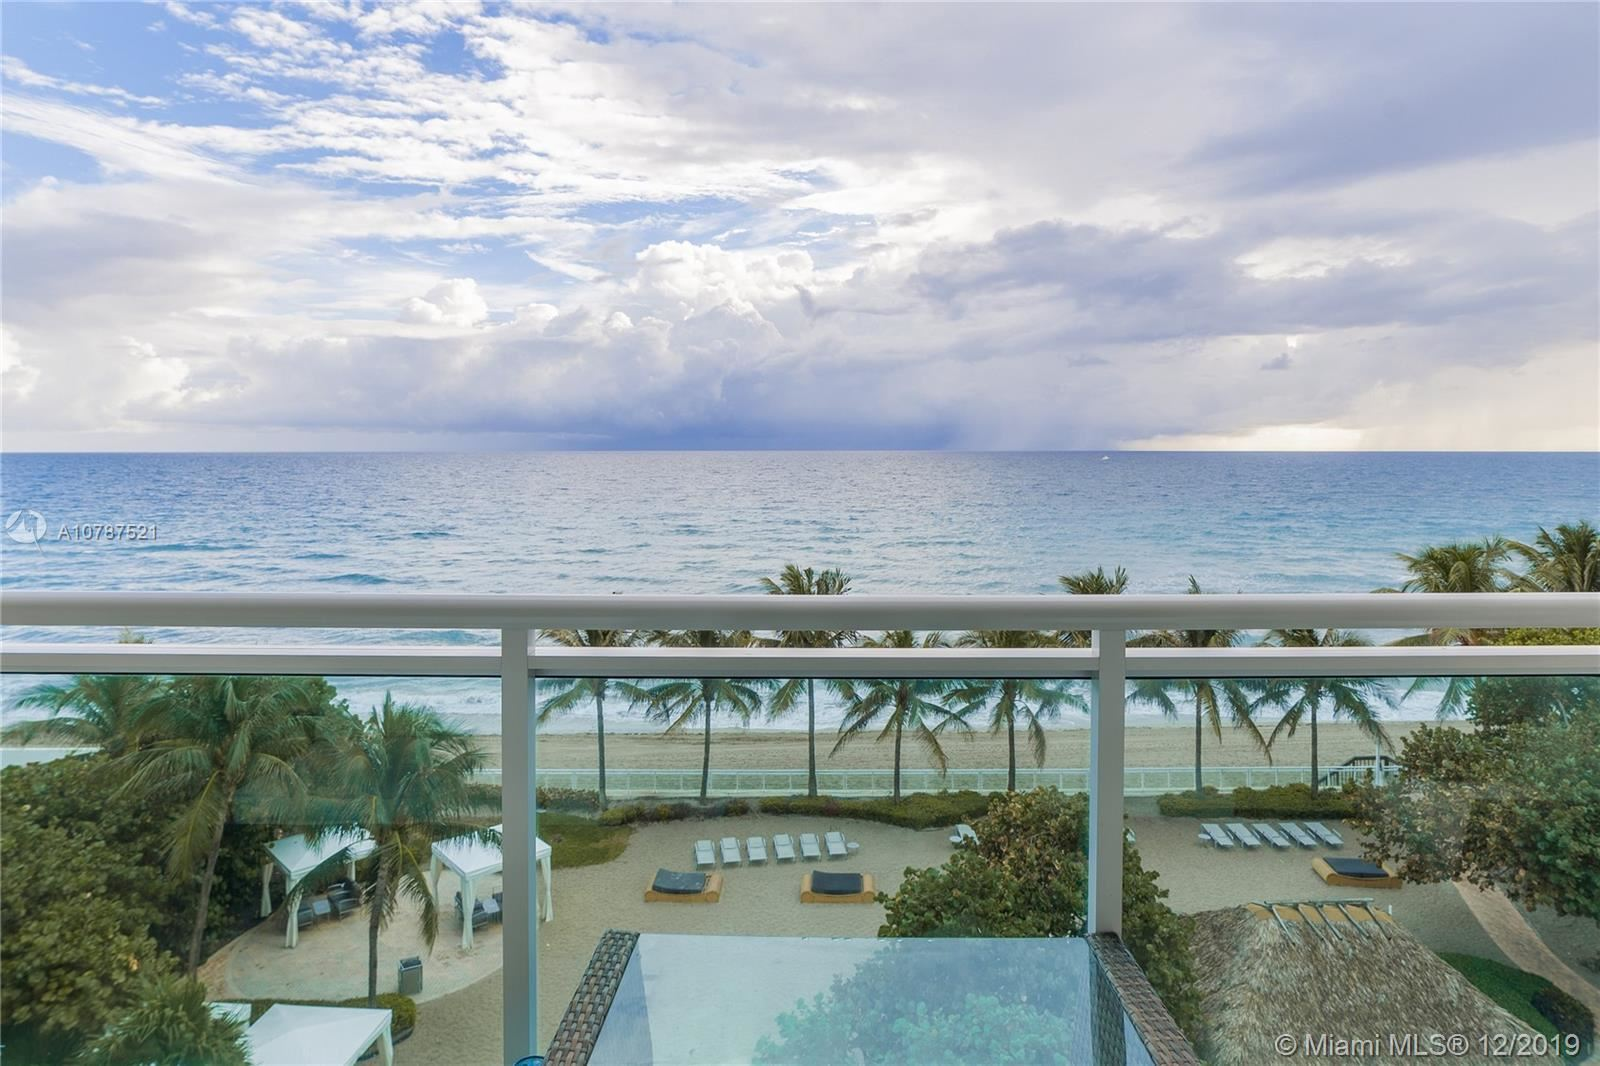 3001 S Ocean Dr #611, Hollywood, FL 33019 - #: A10787521